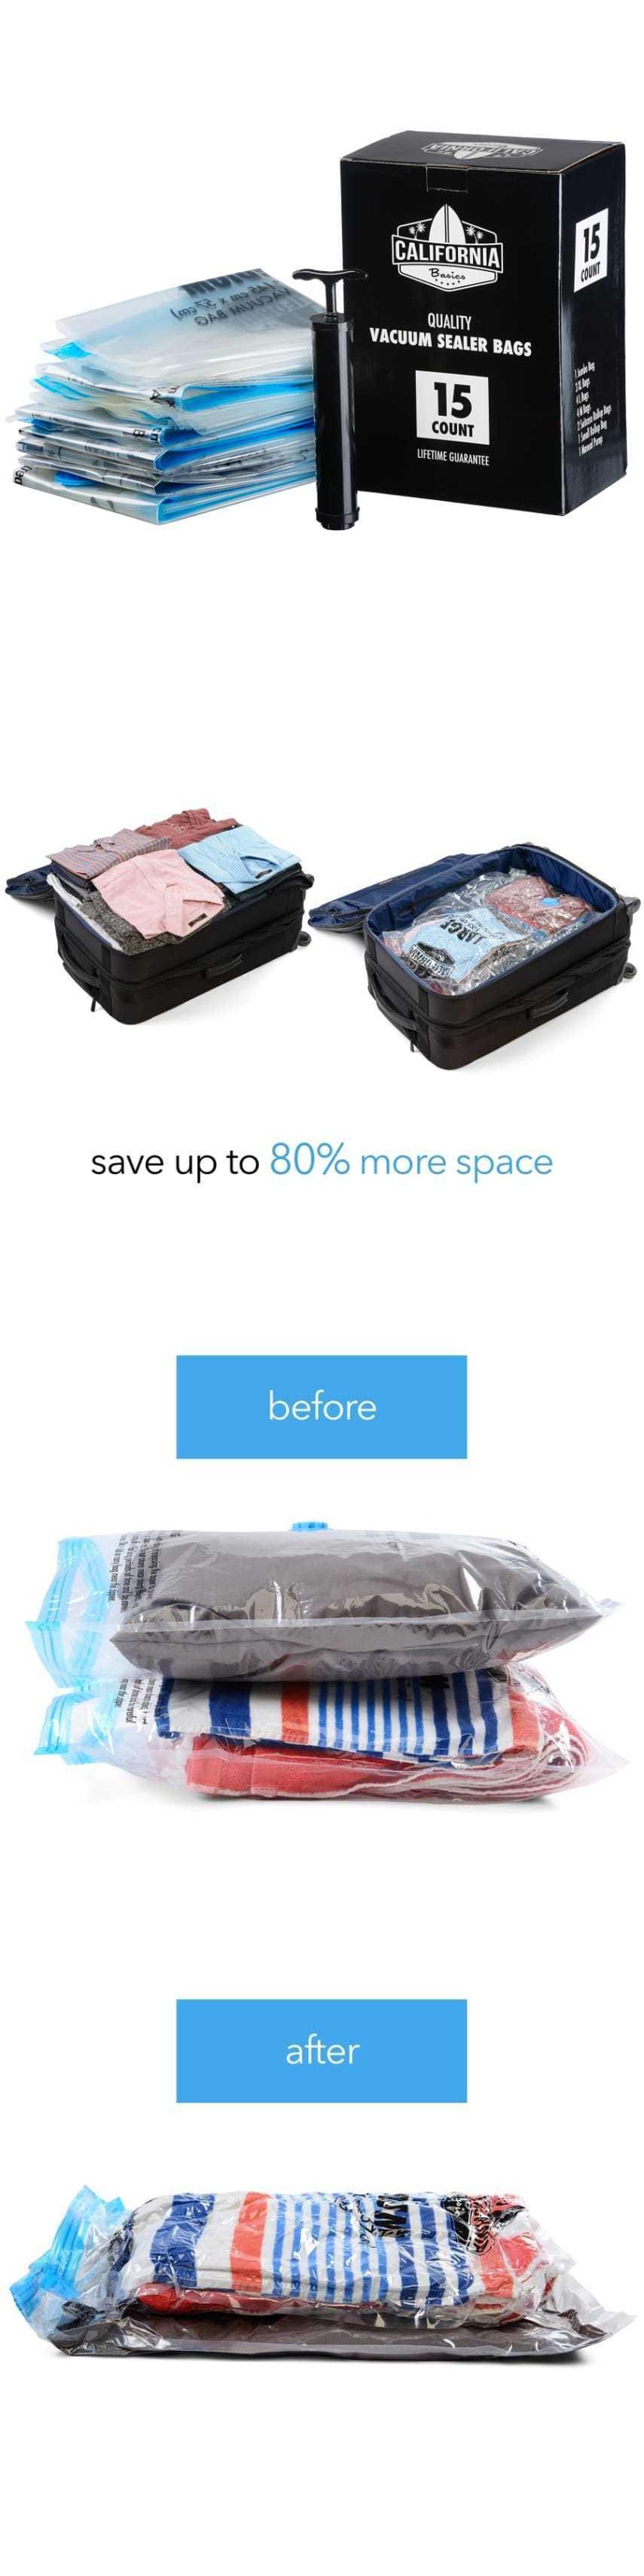 Storage Bags 43504 Space Saver Vacuum Bags Storage Seal 15 Pack Clothing Compressed Organizer Bag  sc 1 st  Pinterest & Storage Bags 43504: Space Saver Vacuum Bags Storage Seal 15 Pack ...